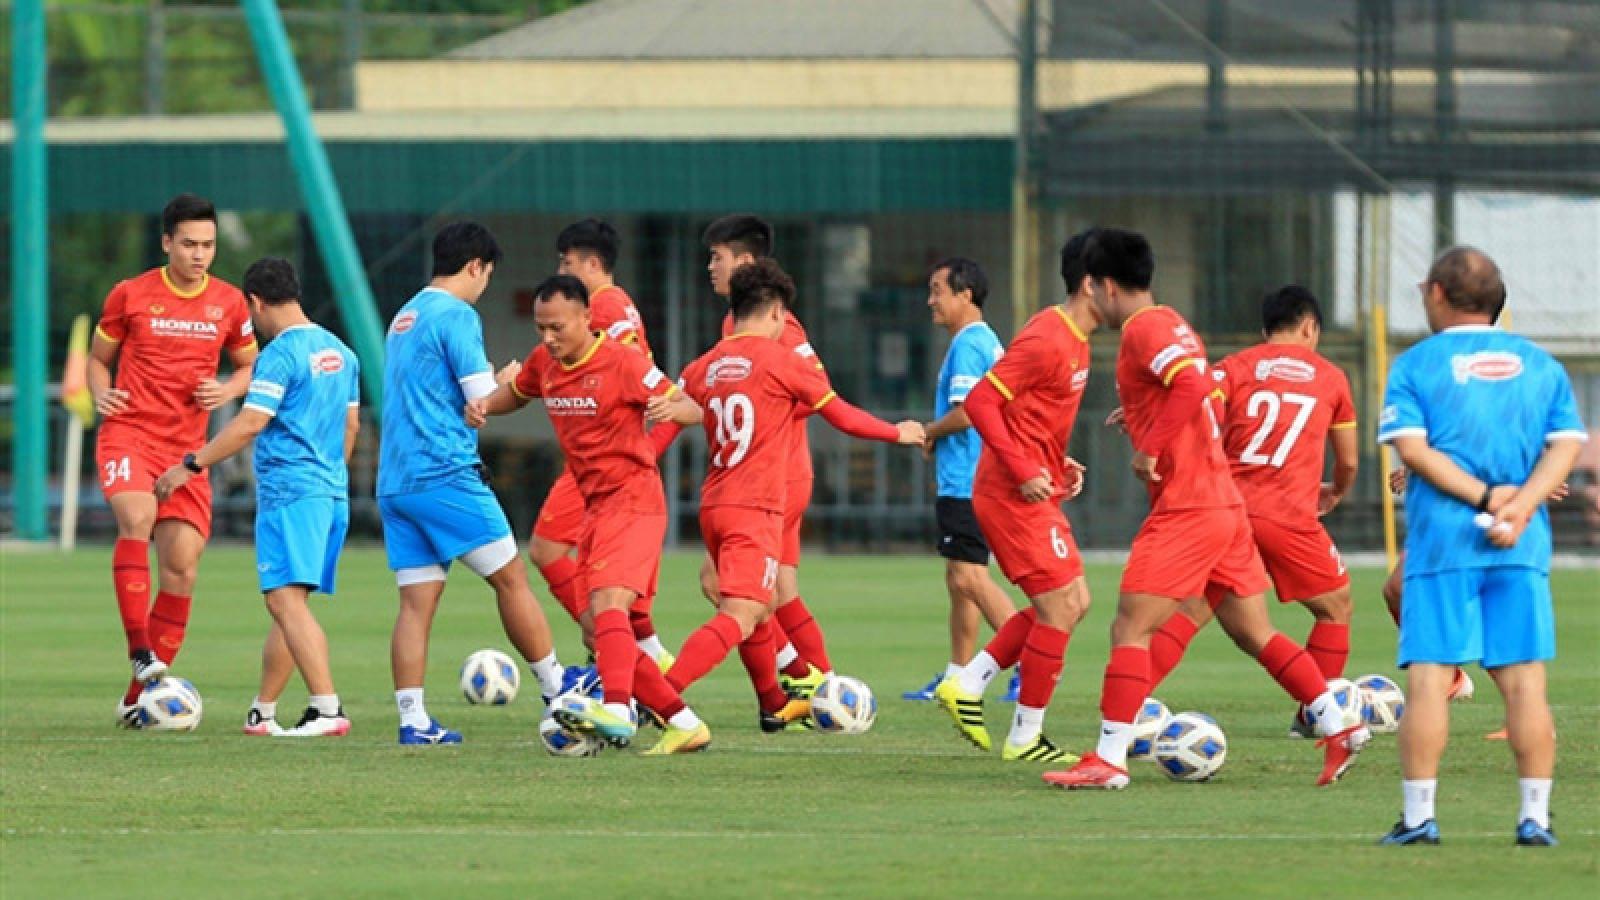 National team to play friendlies against U22s